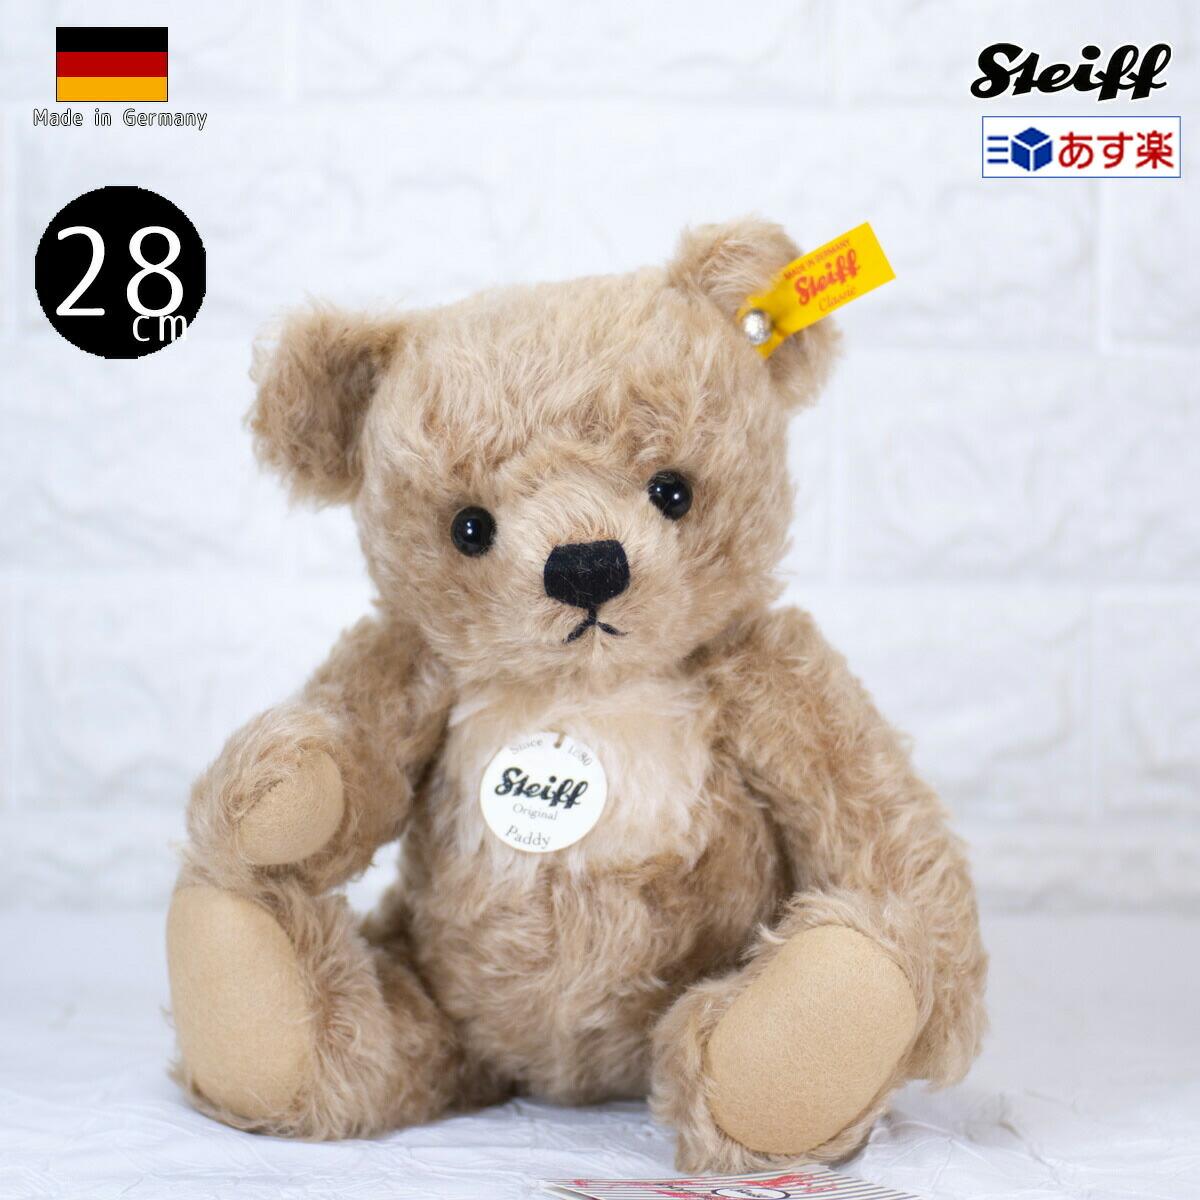 Steiff シュタイフ社 テディベア シュタイフ クラシック パディ OUTLET SALE PADDY steiff BEAR TEDDY 即日出荷 CLASSIC 28cm